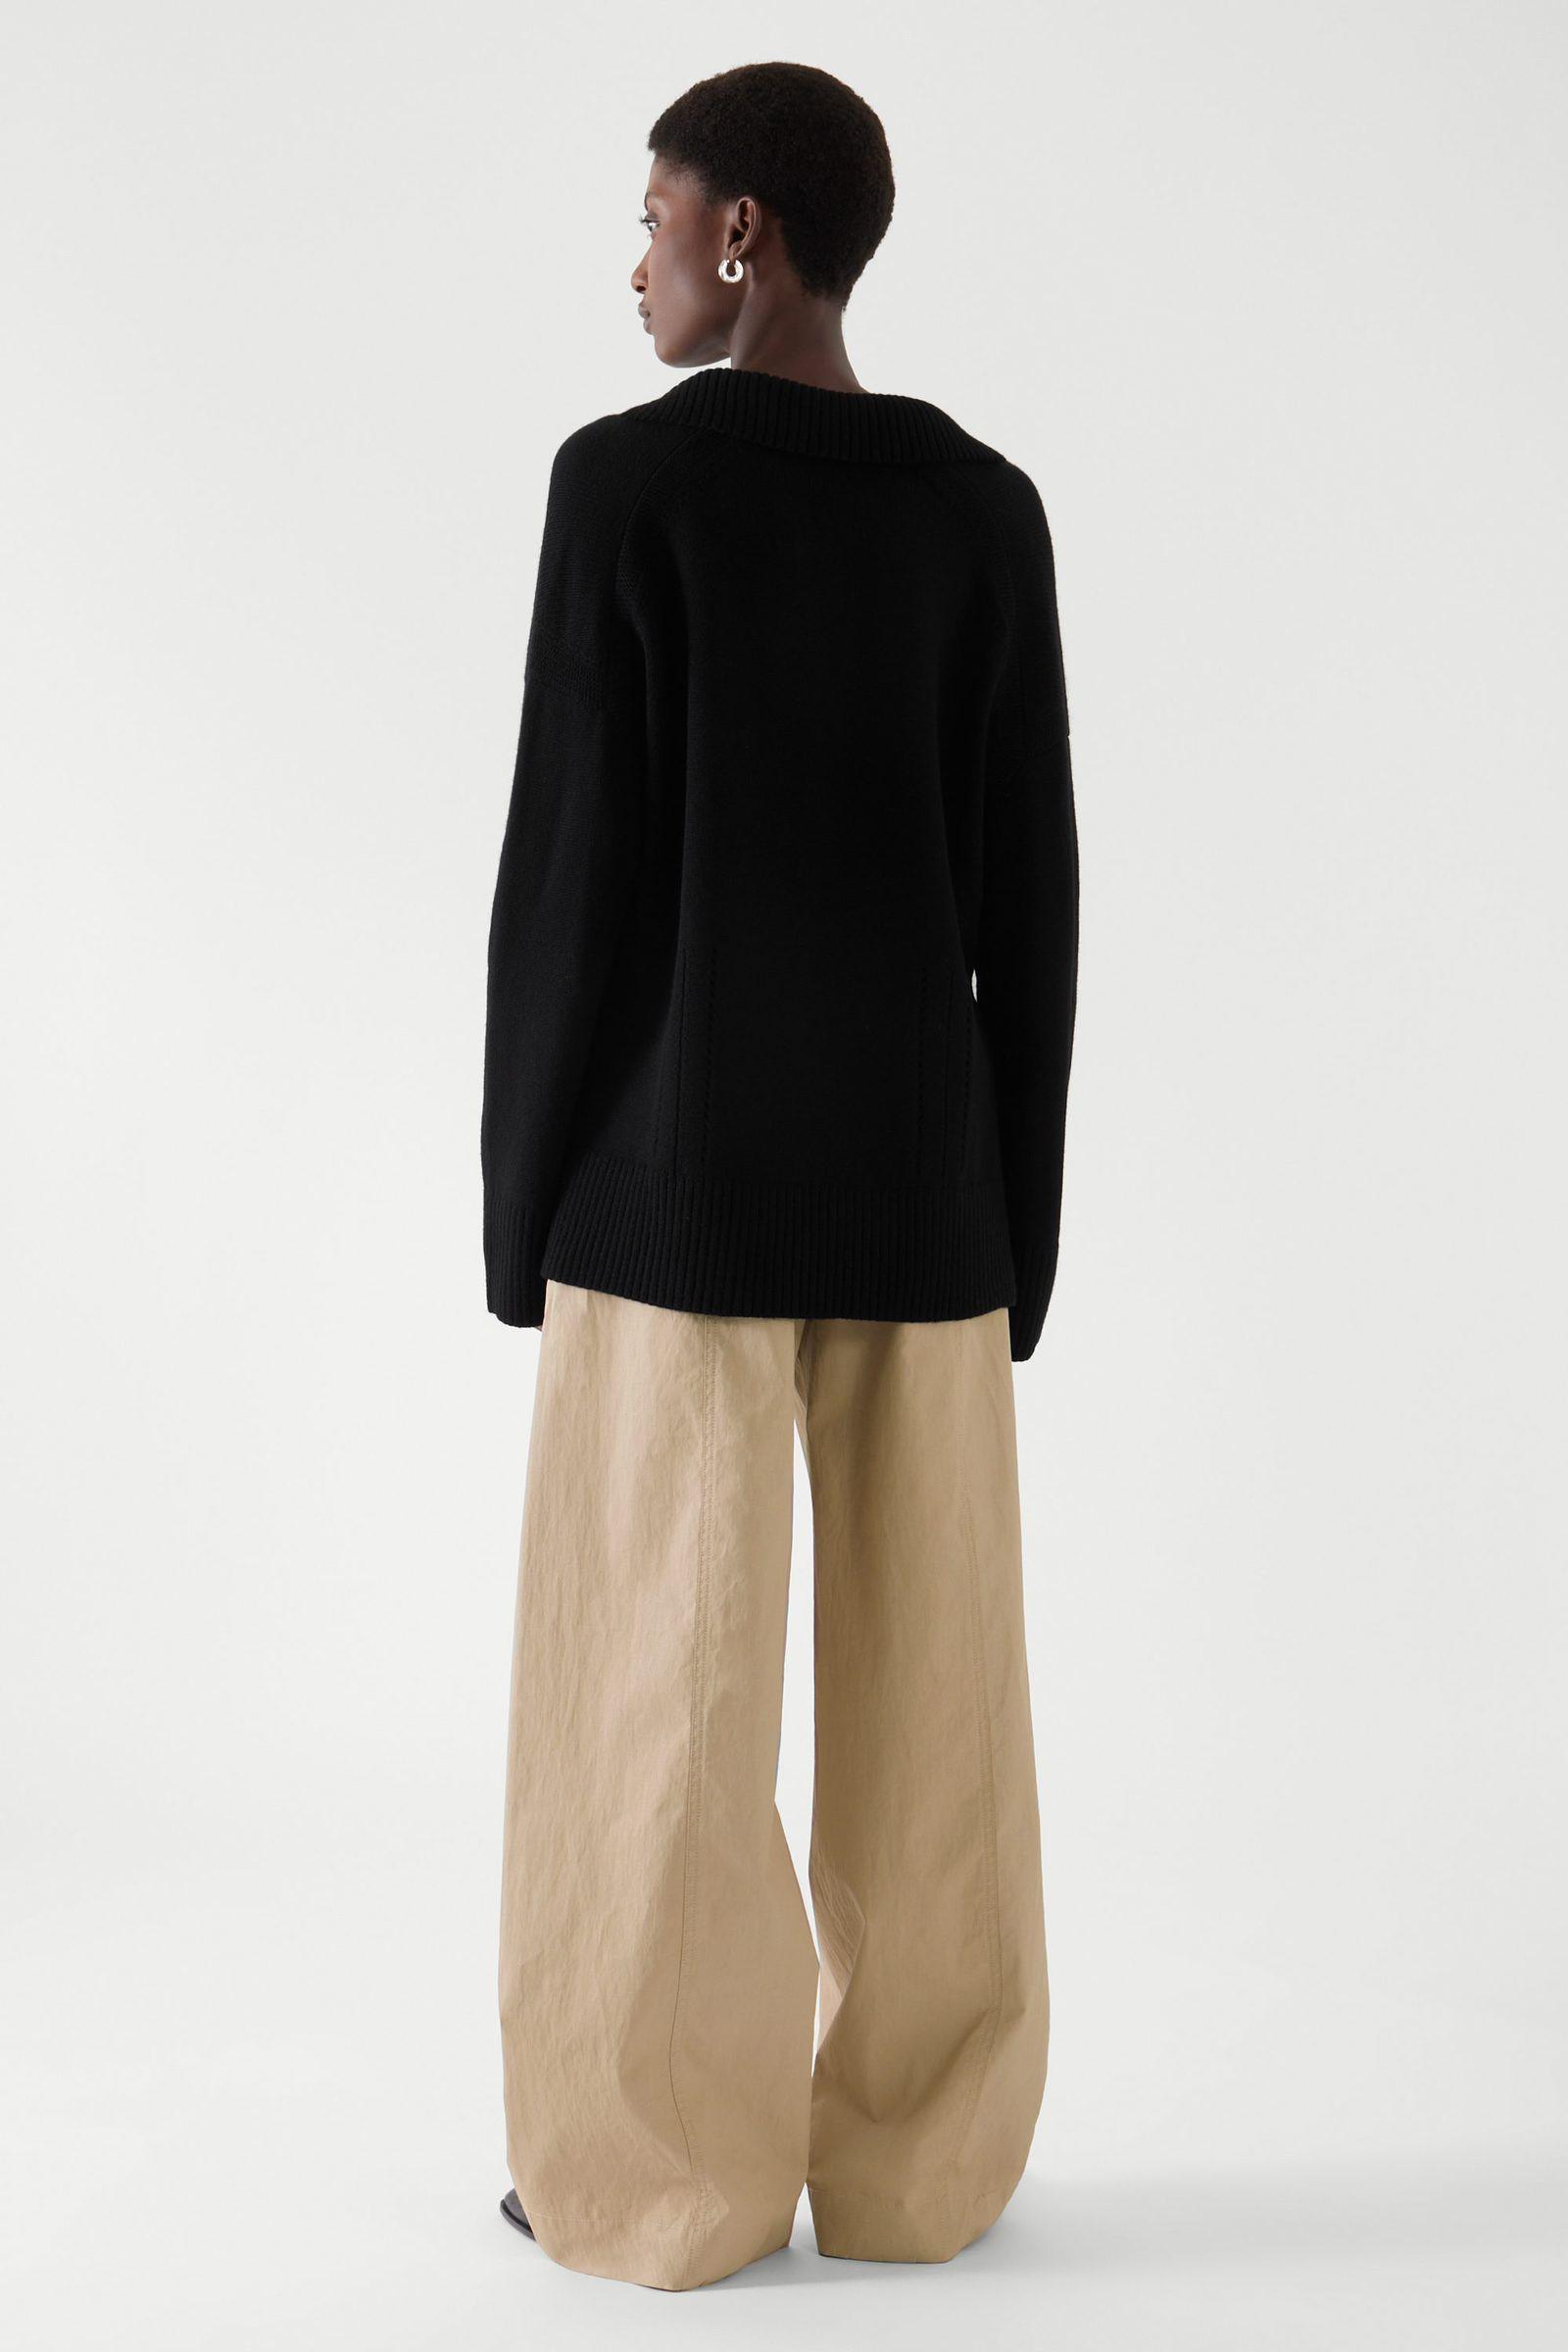 COS 니티드 브이넥 스웨터의 블랙컬러 ECOMLook입니다.